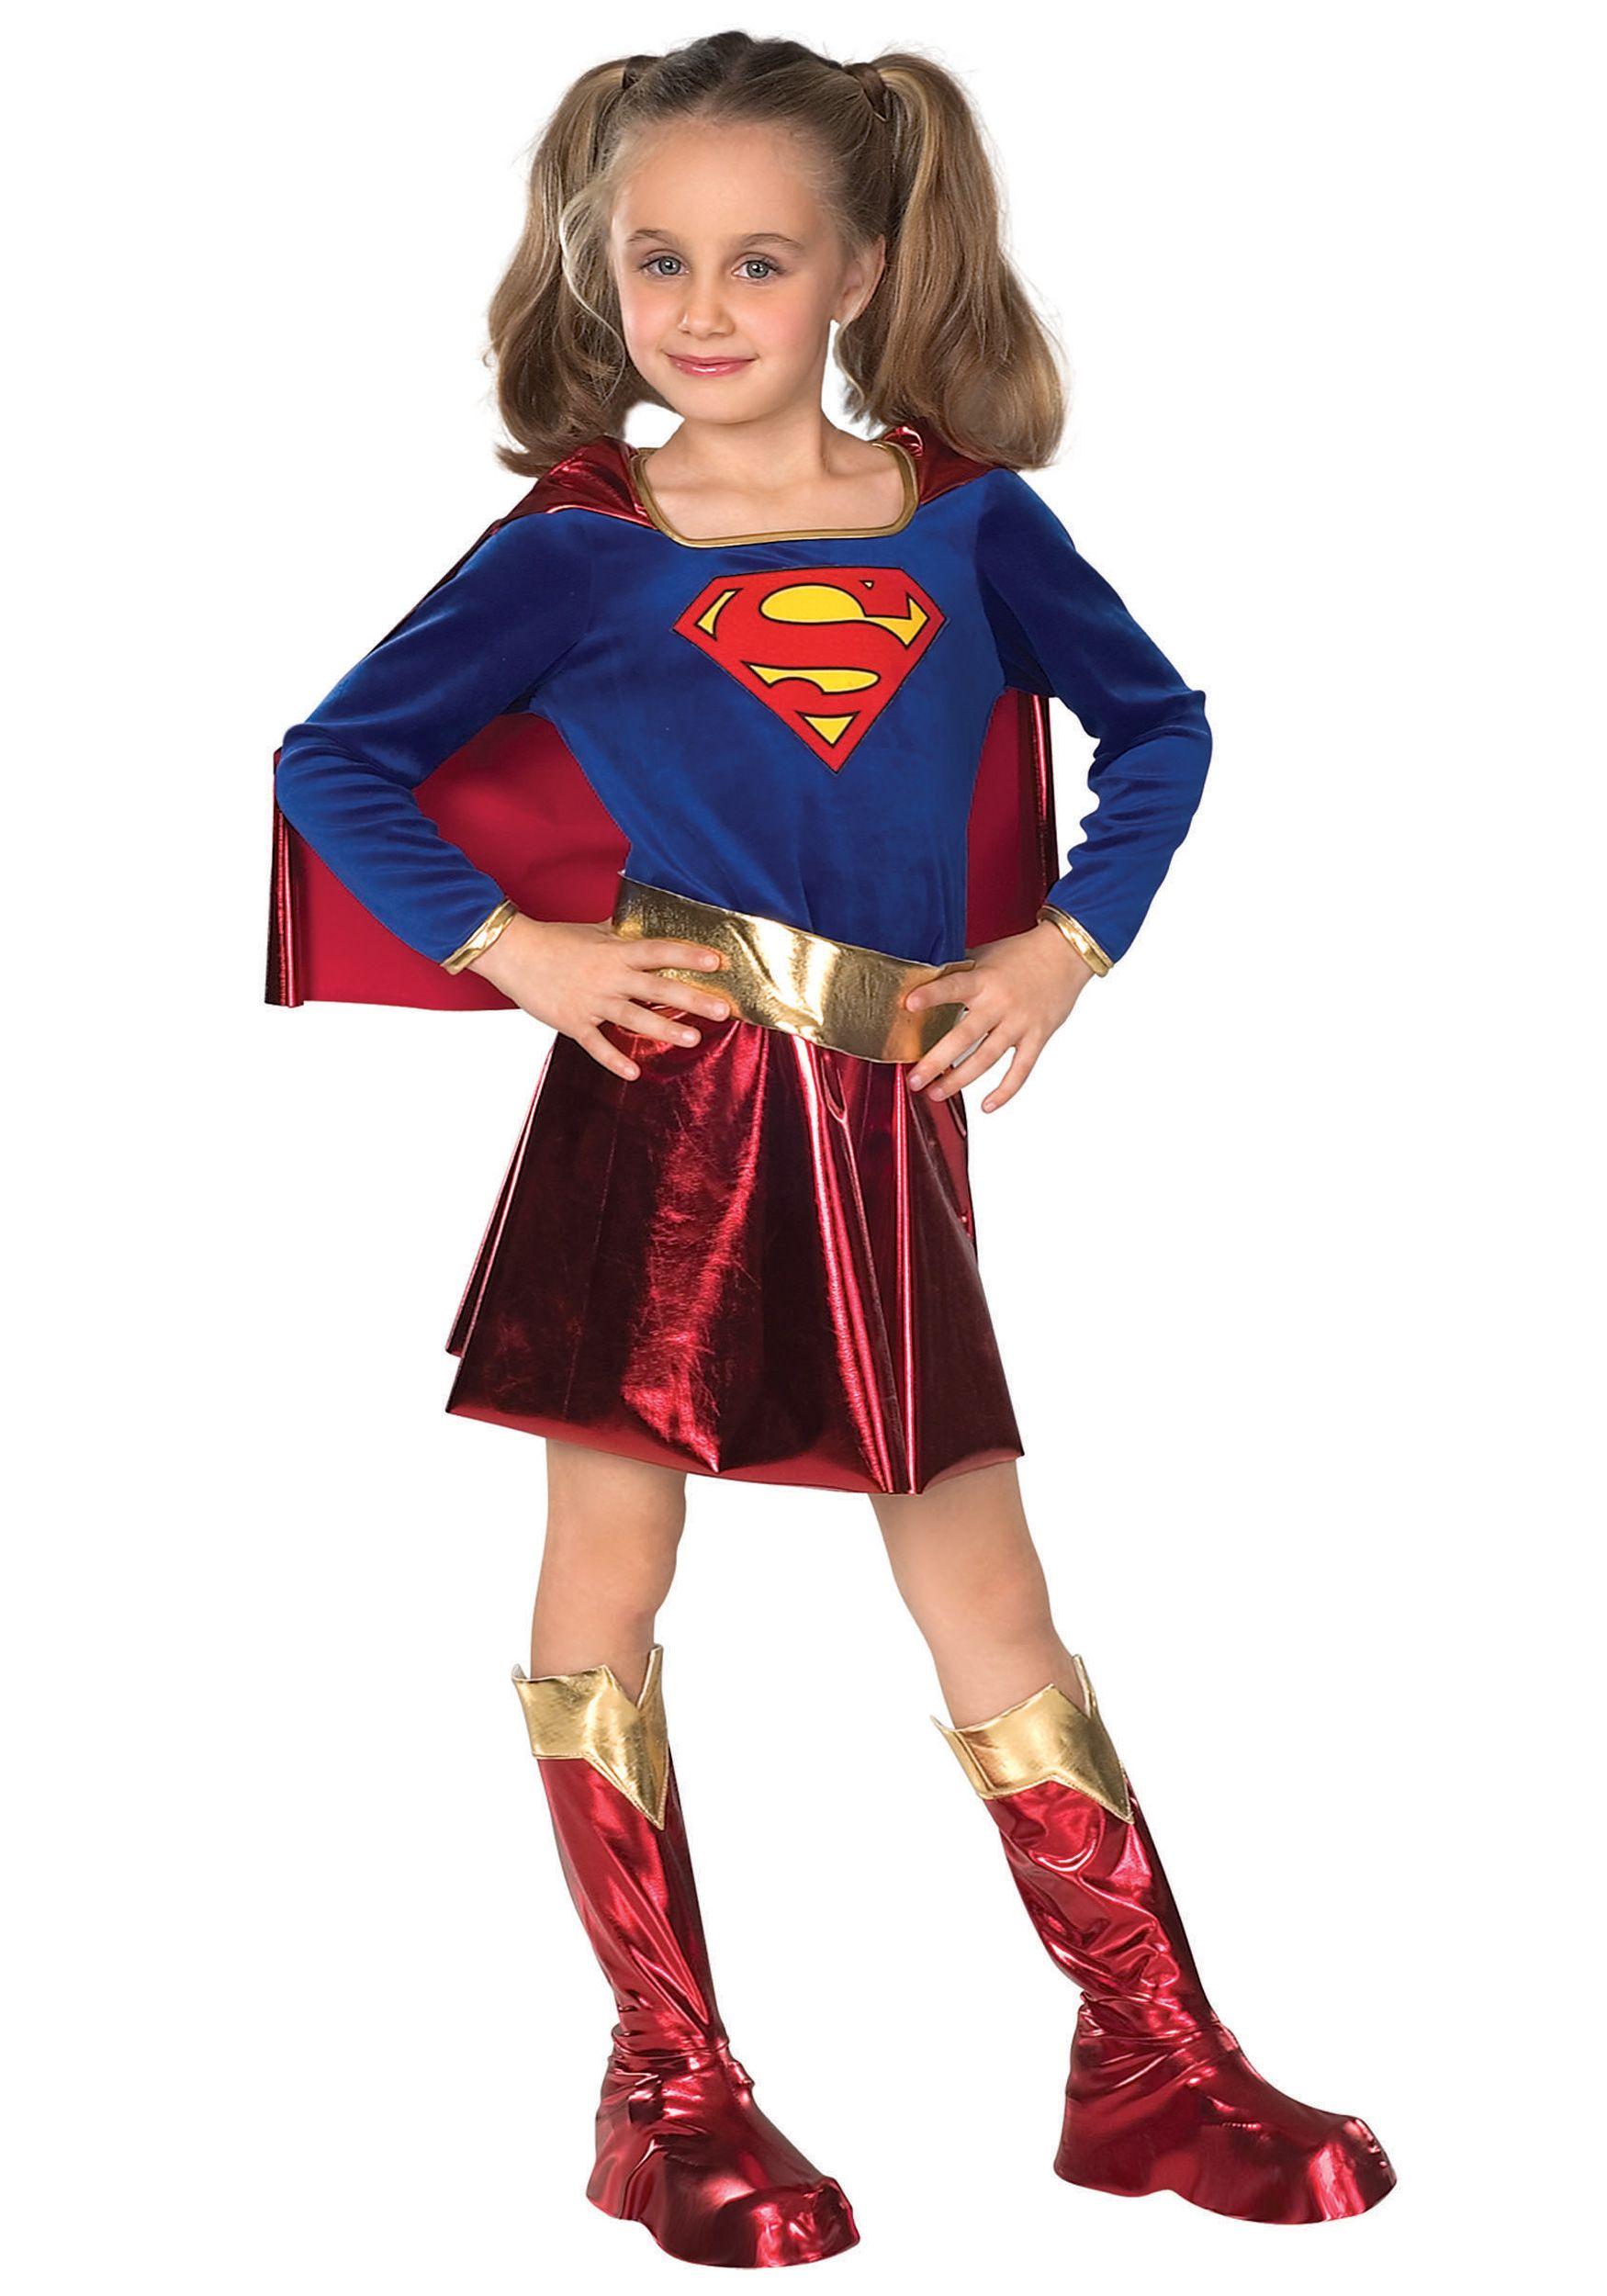 Discount Superhero Costumes For Kids  sc 1 st  Pinterest & Discount Superhero Costumes For Kids | Fun for Kenli u0026 Kenzi ...